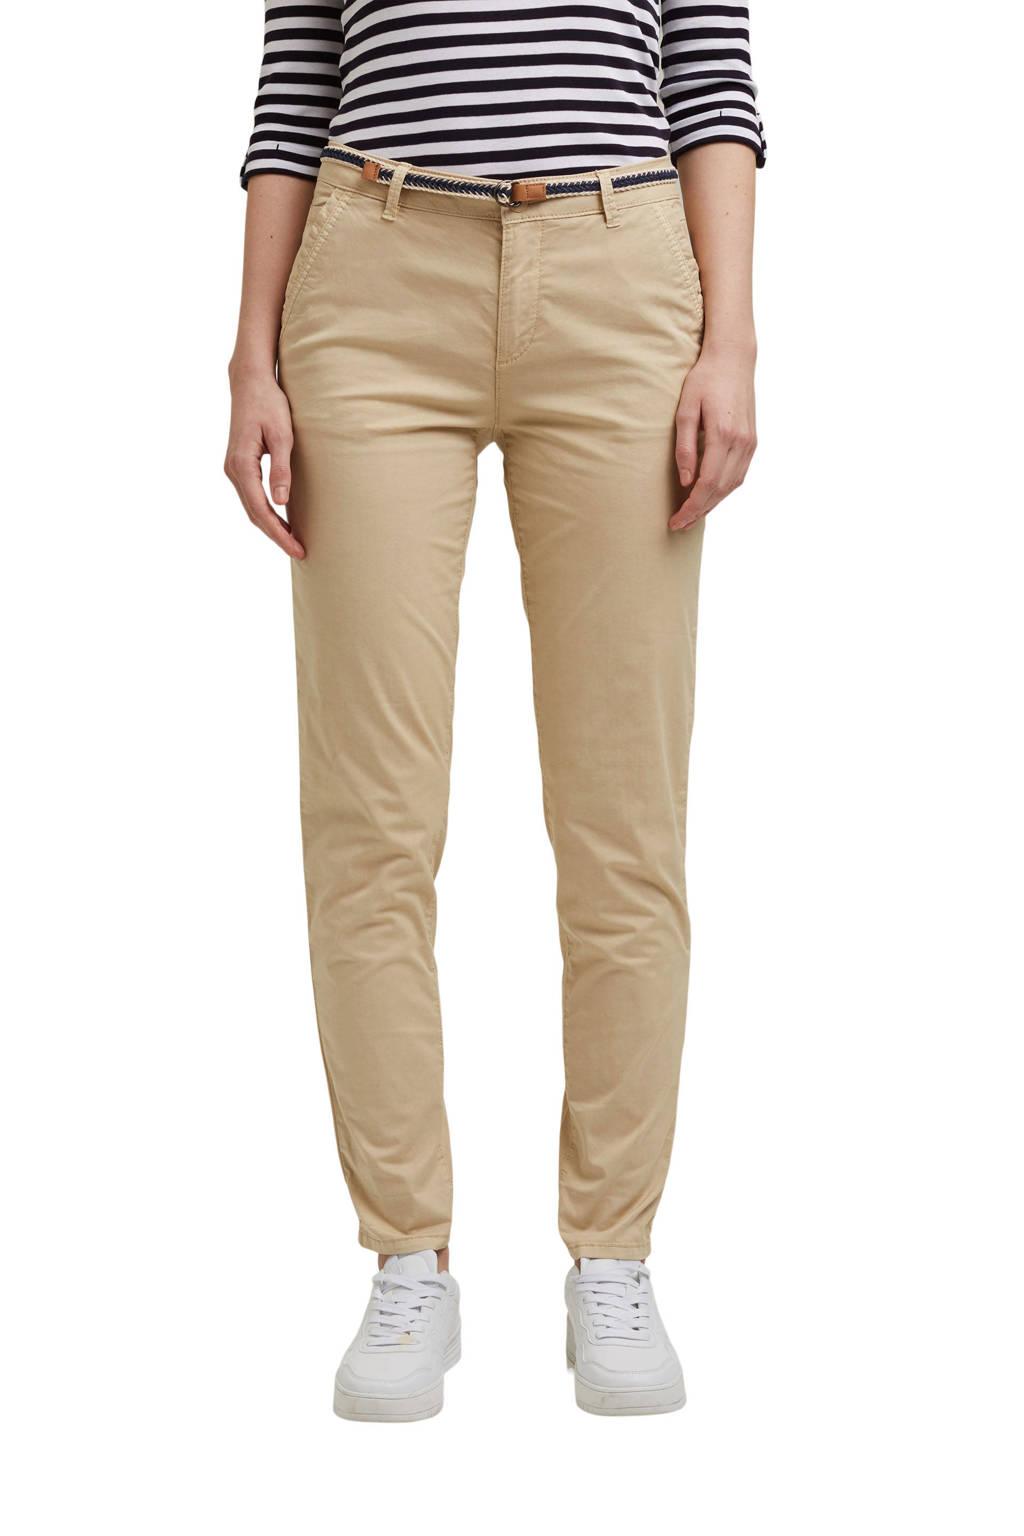 ESPRIT Women Casual slim fit broek beige, Beige